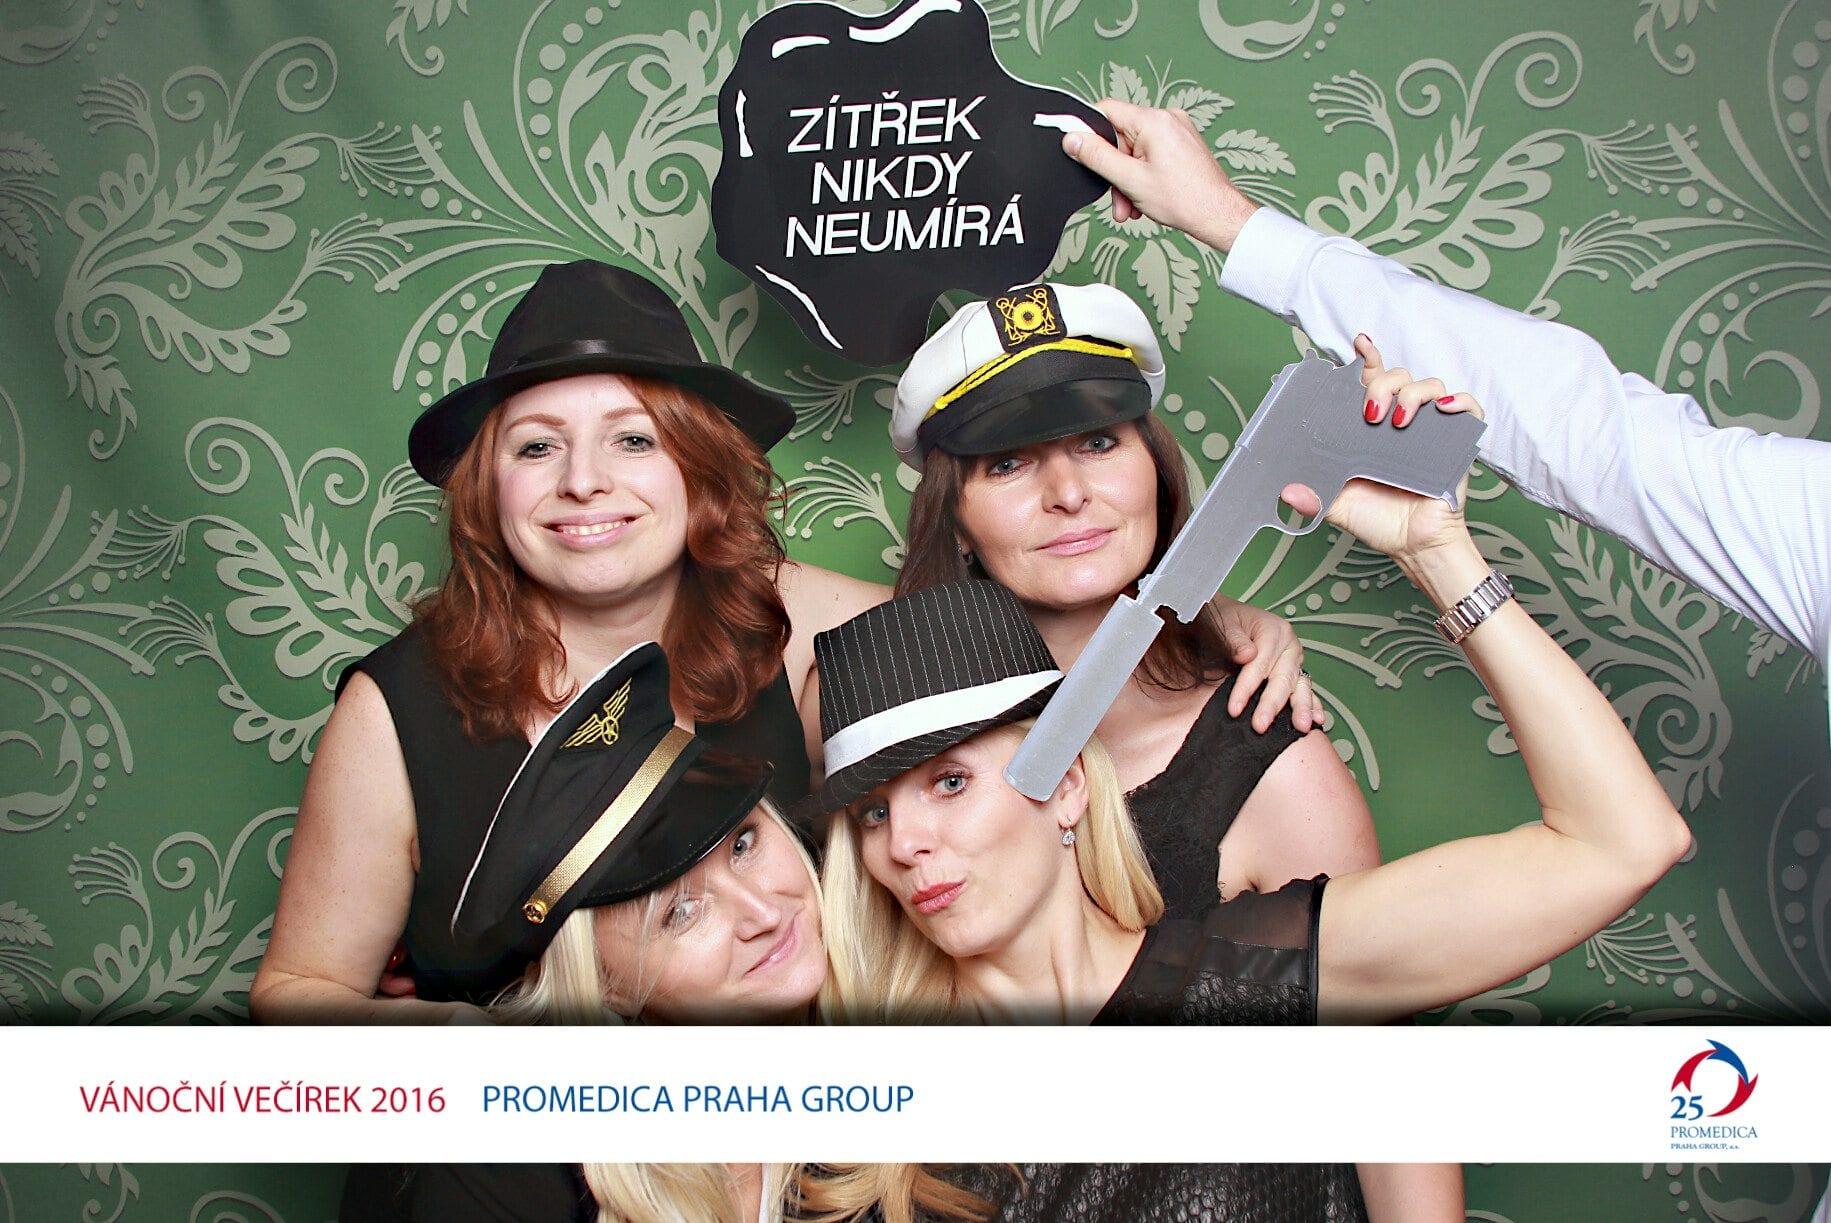 fotokoutek-promedica-vanocni-vecirek-9-12-2016-179926